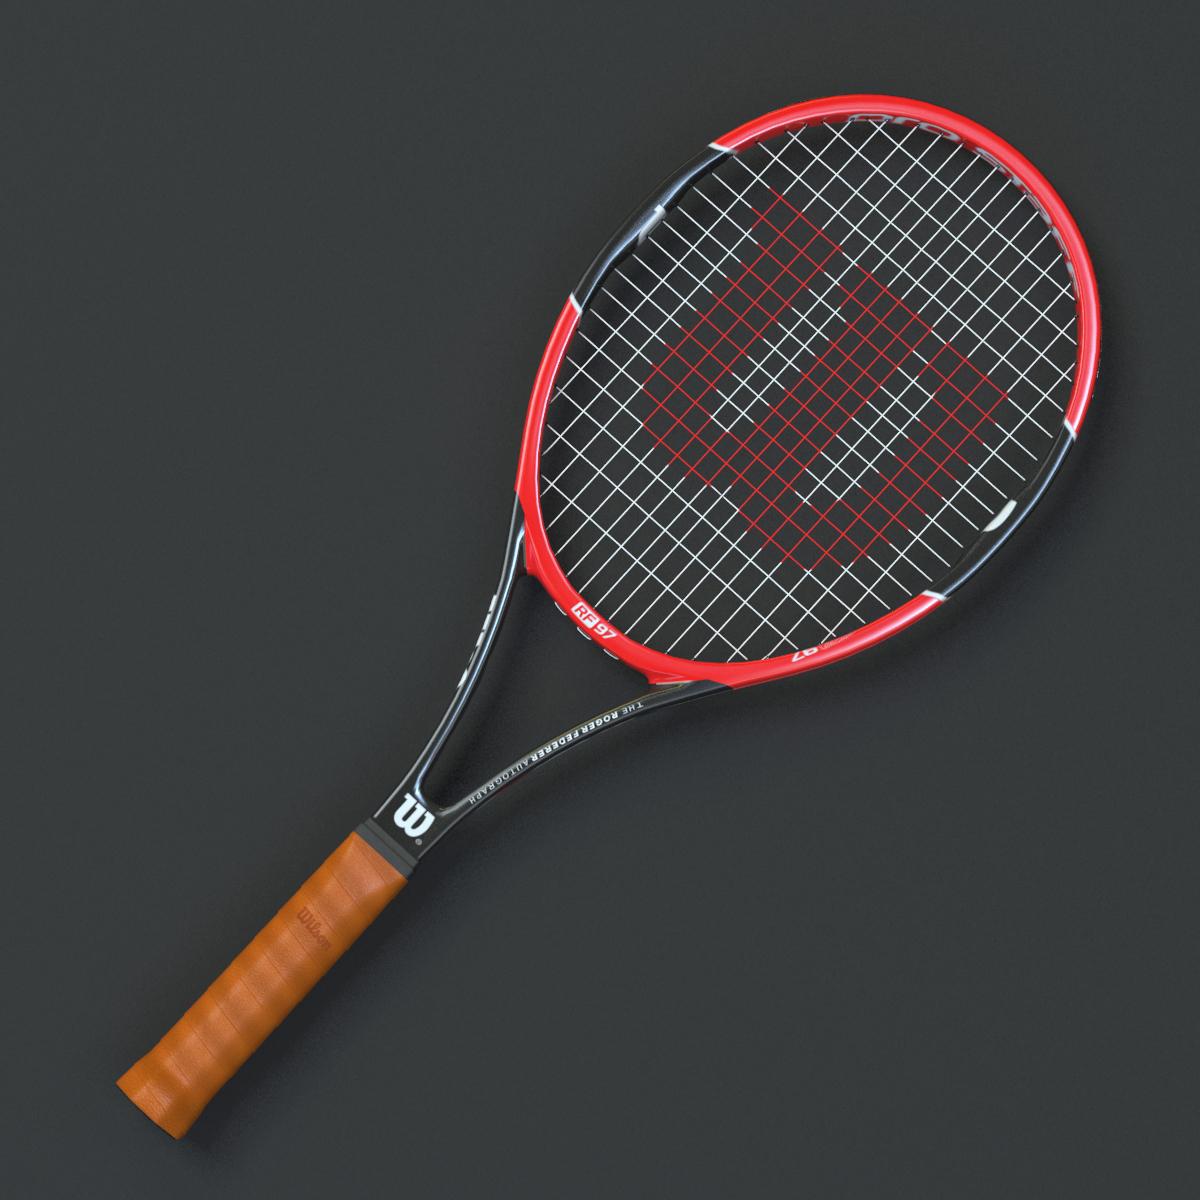 Wilson Pro Staff >> Tennis Racket Wilson Prostaff 97 Rf